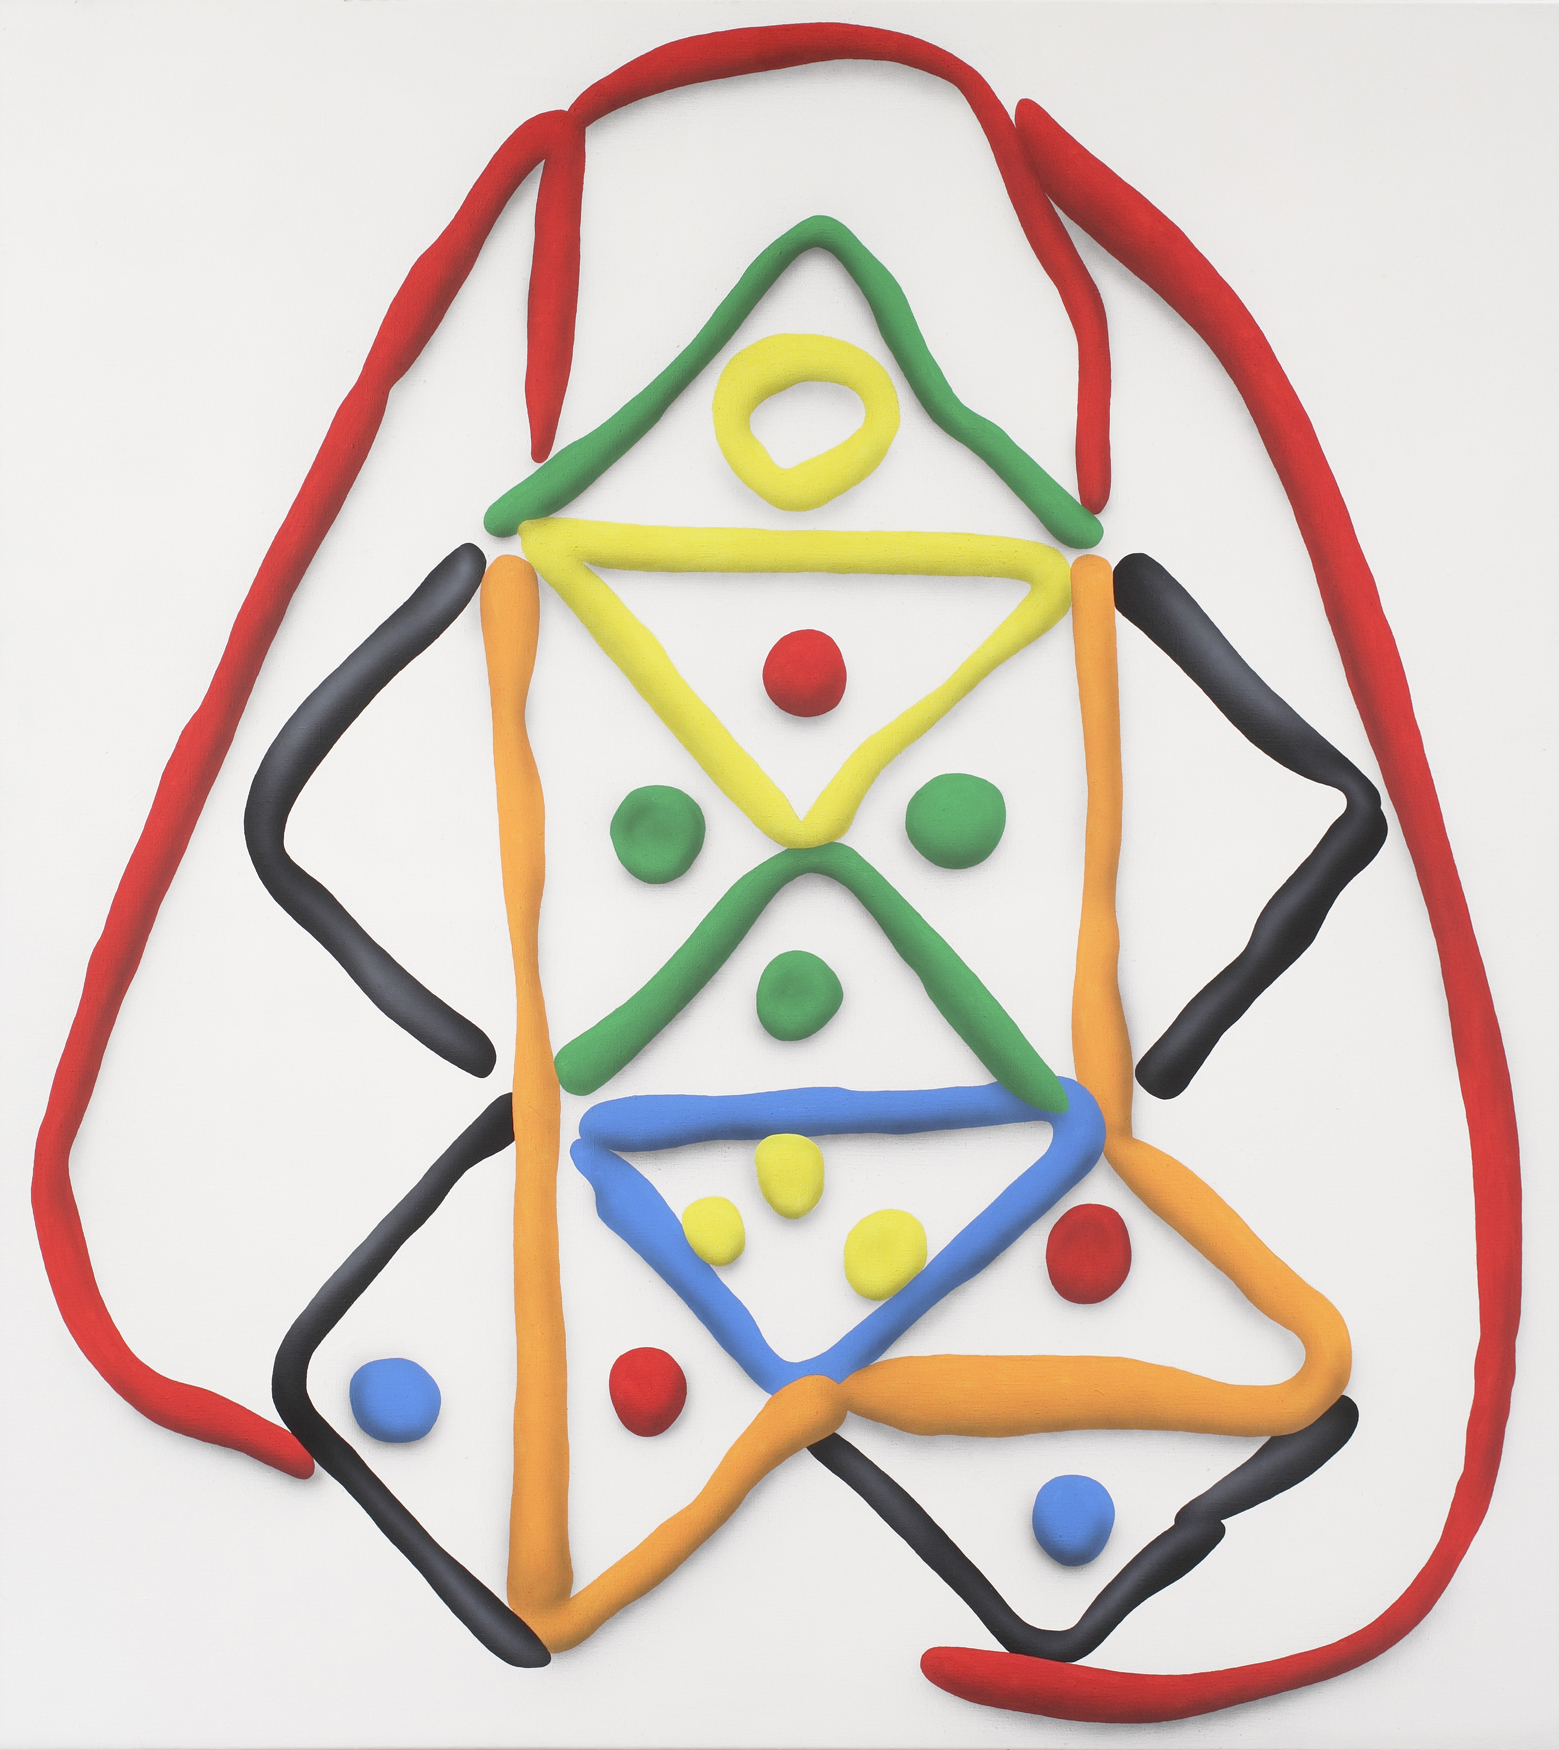 Pythagorean theorem II. 2010, acrylic on canvas, 200 x 180 cm